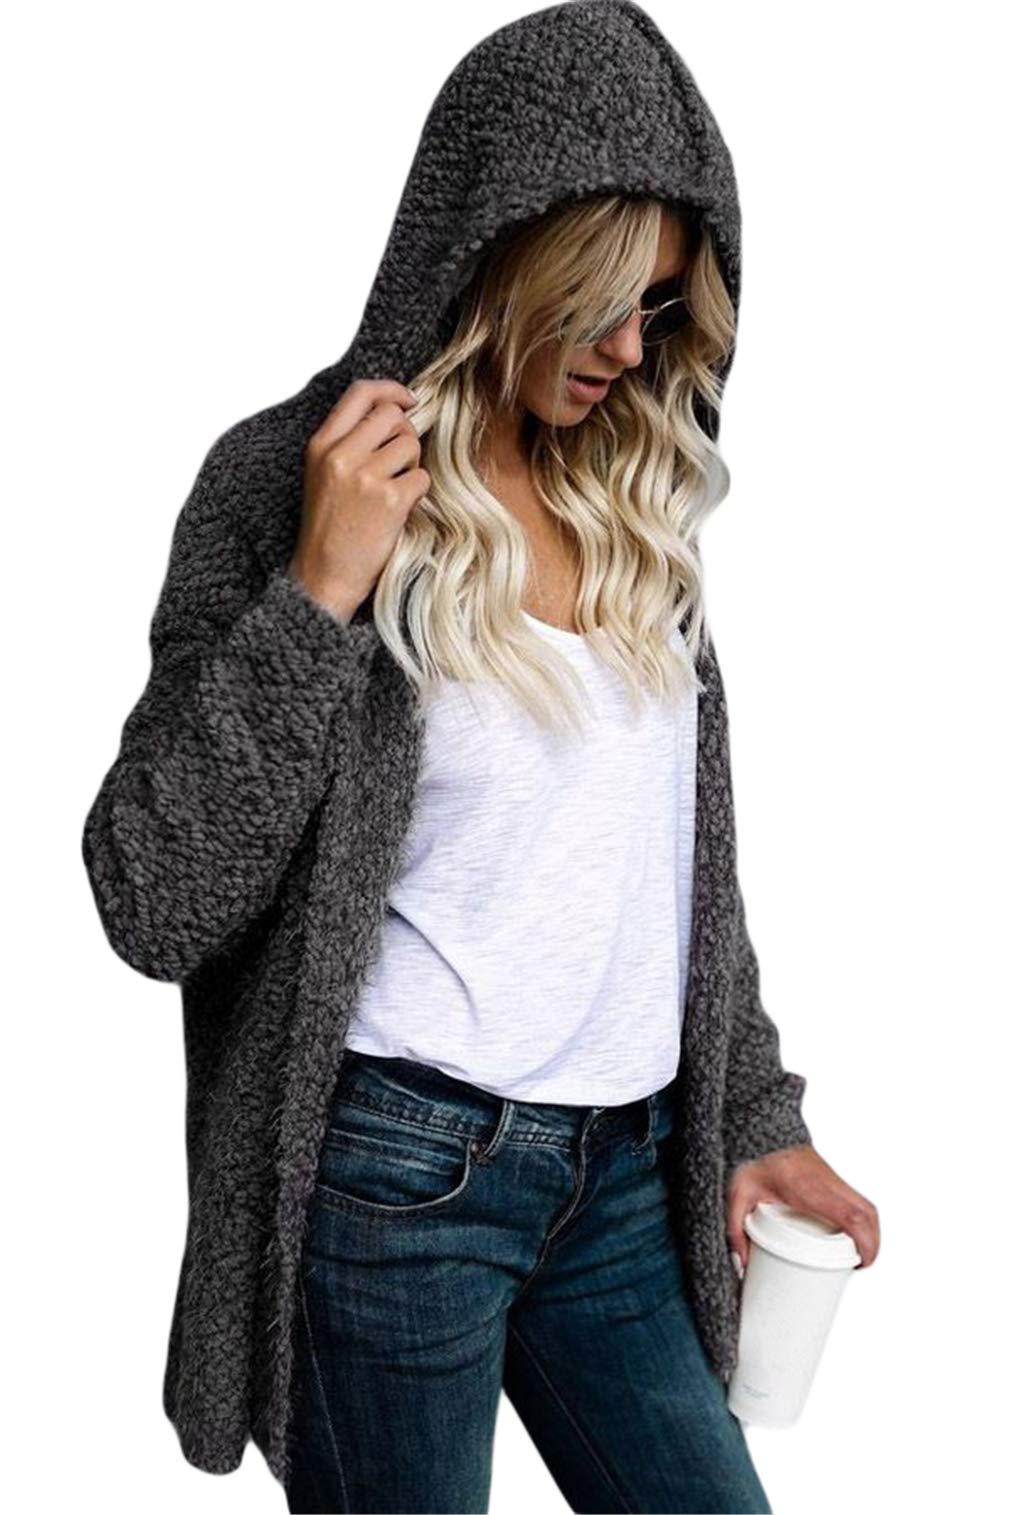 Happy Sailed Women Long Sleeve Faux Shearling Shaggy Oversized Open Front Coat Jacket Warm Hooded Cardigan Small Grey